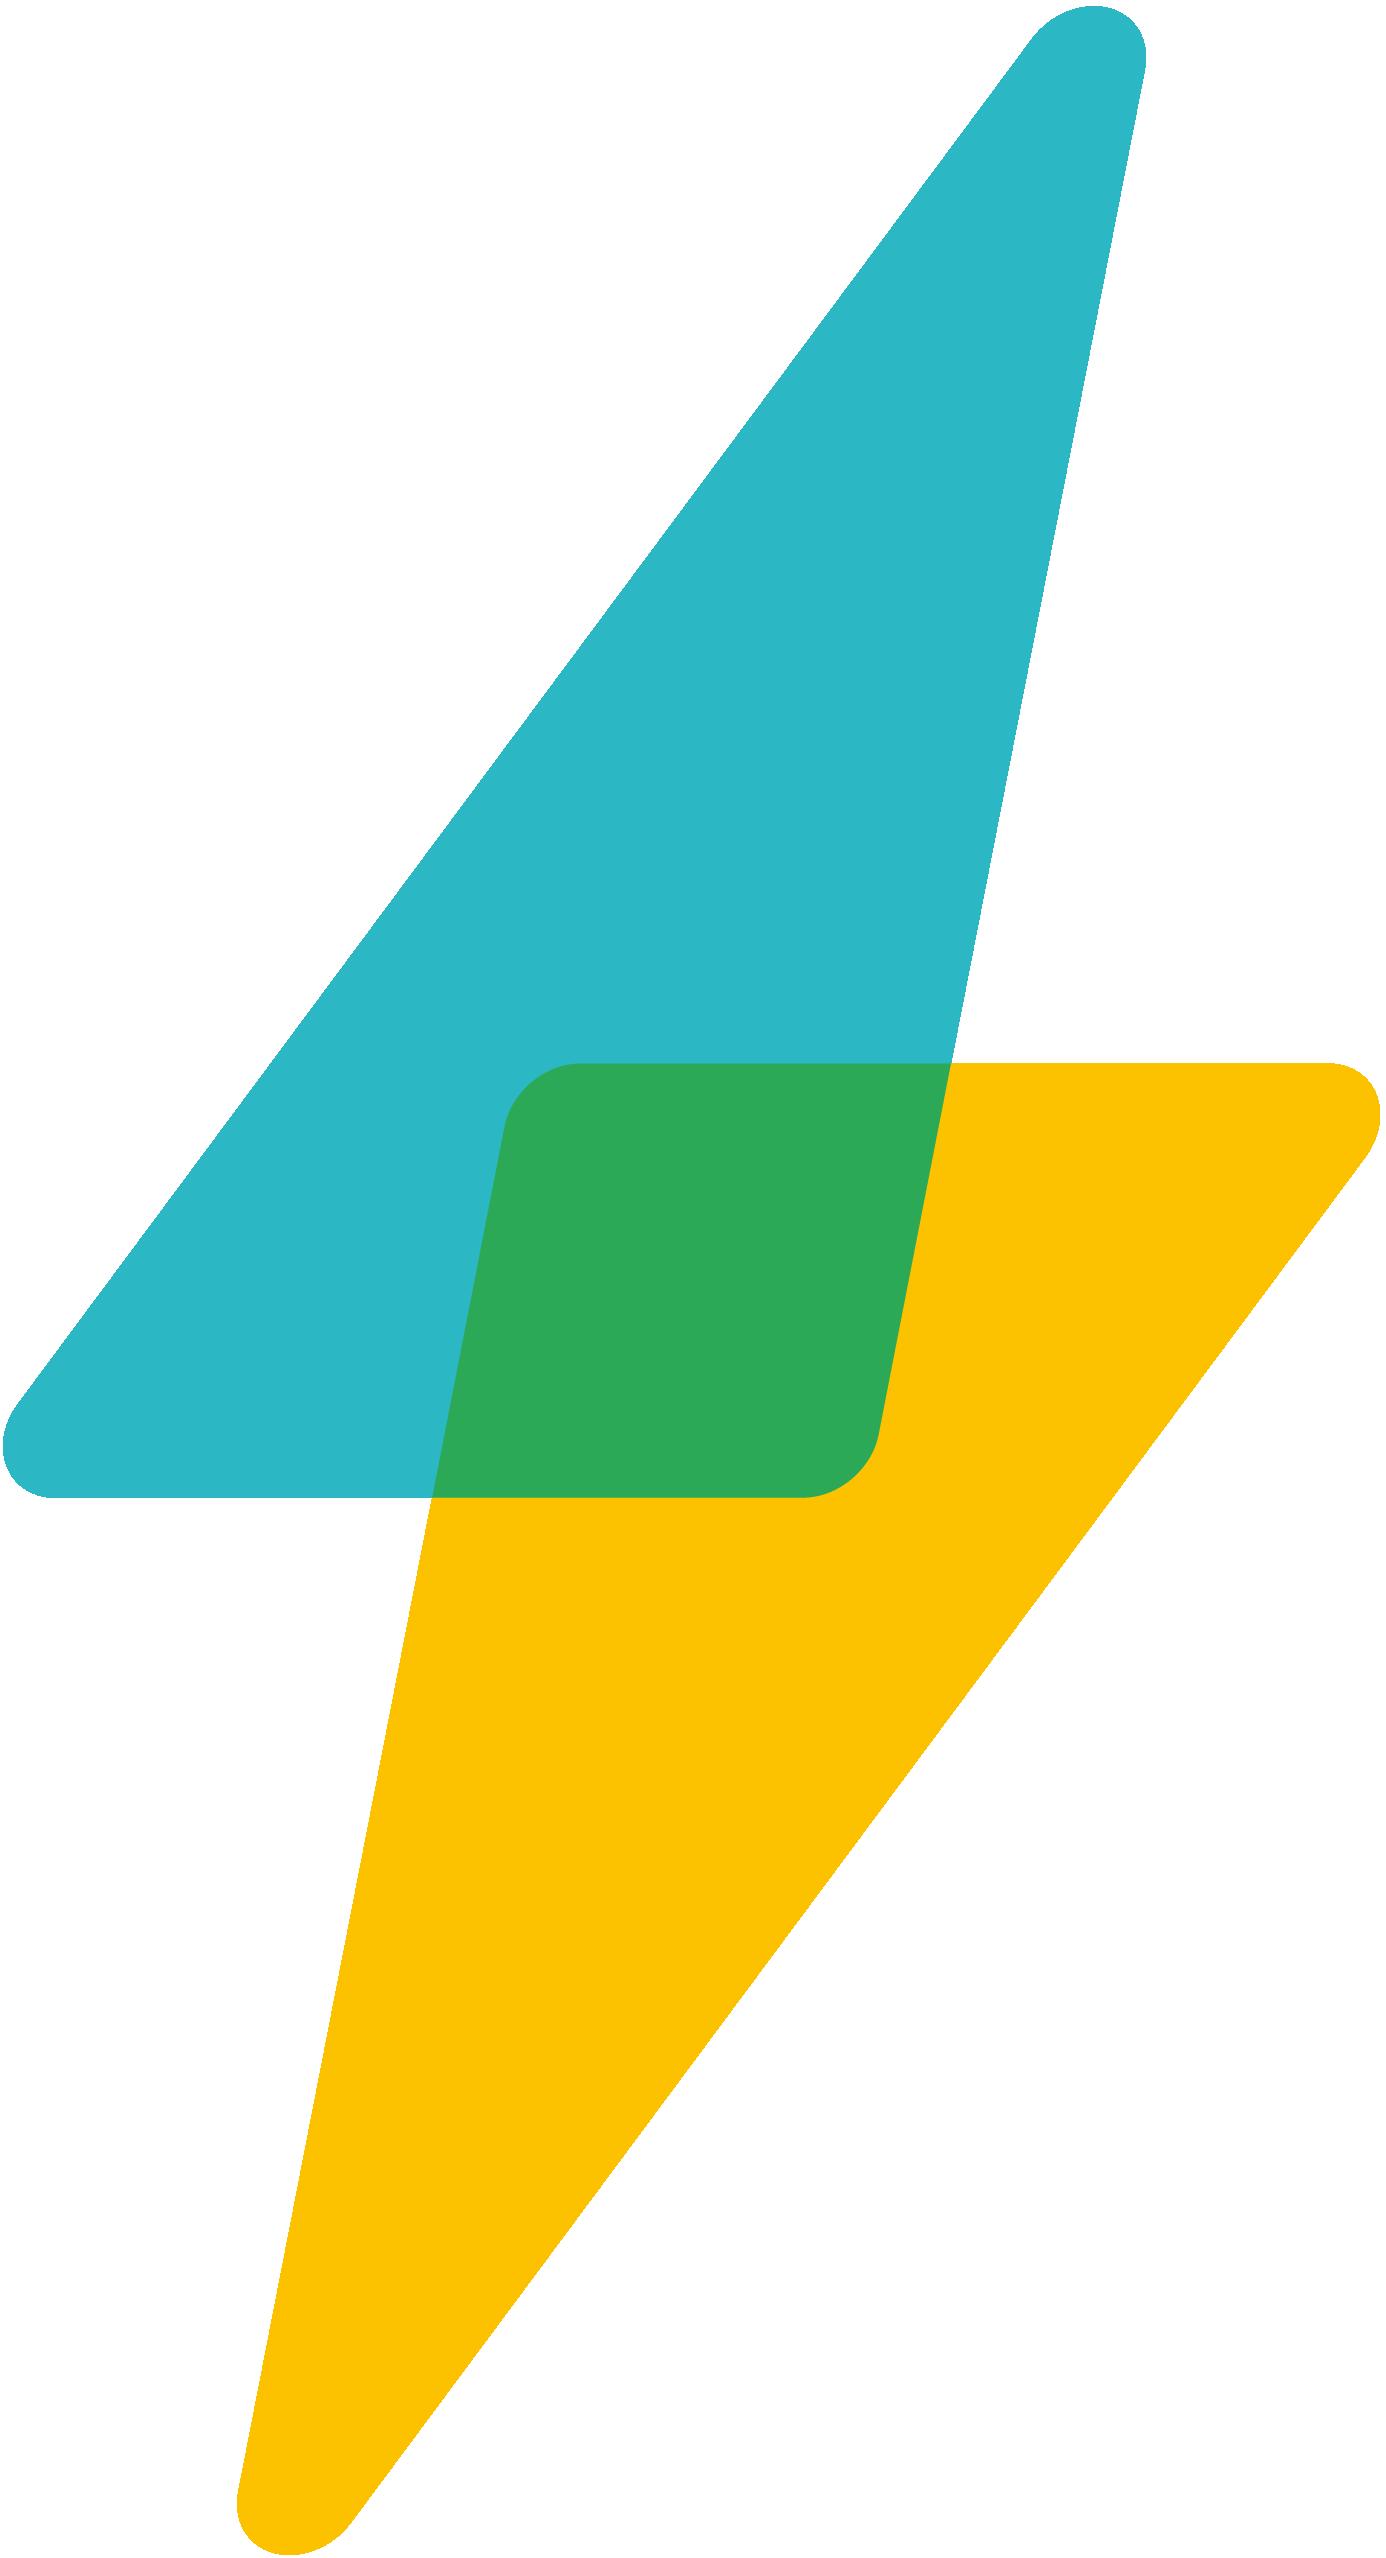 Wifi Spark logo